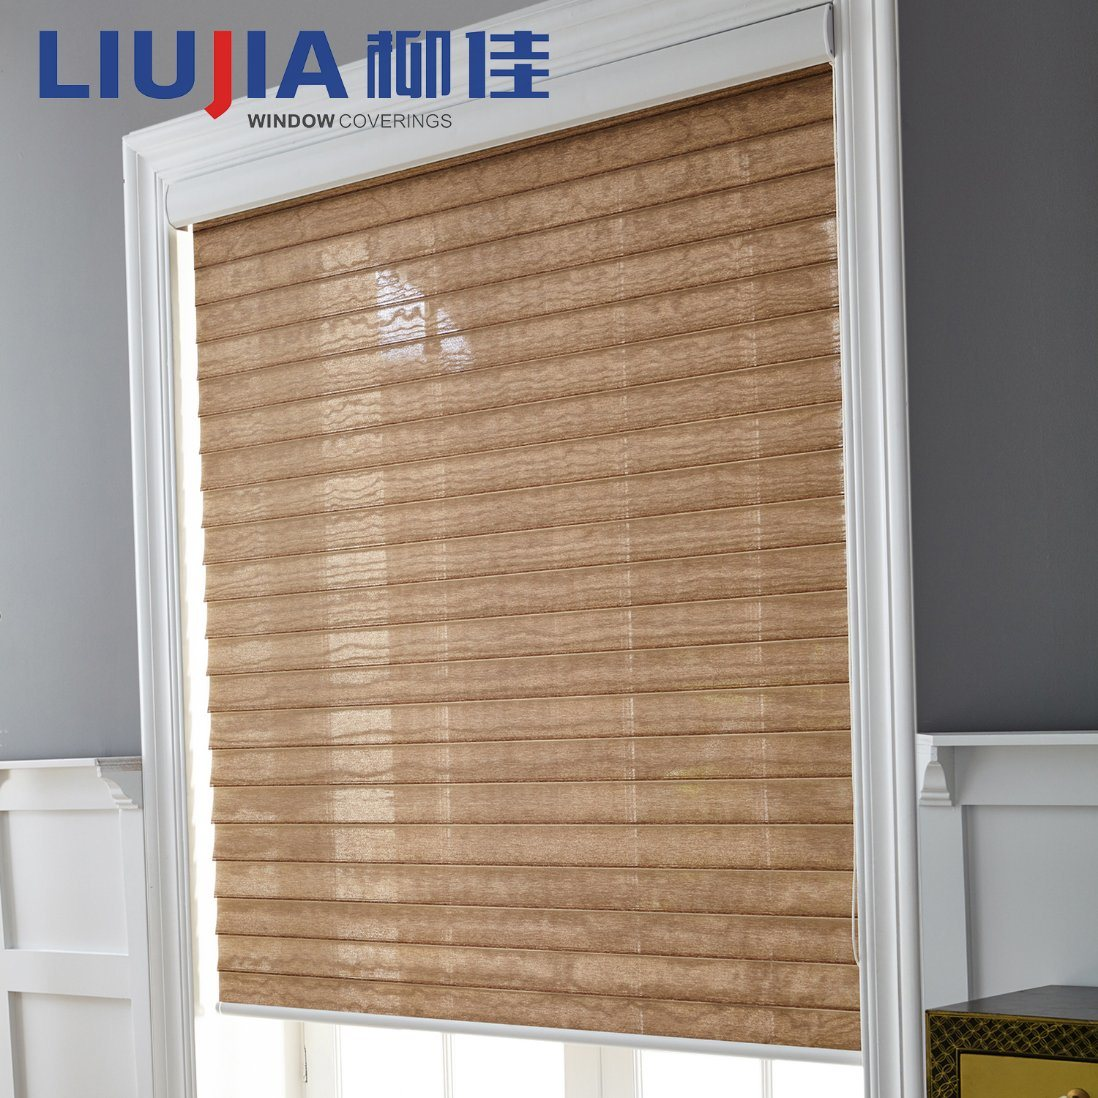 Chinese Drapery Curtains Sheer Shangri La Blinds/Shades   China Blind,  Window Blinds